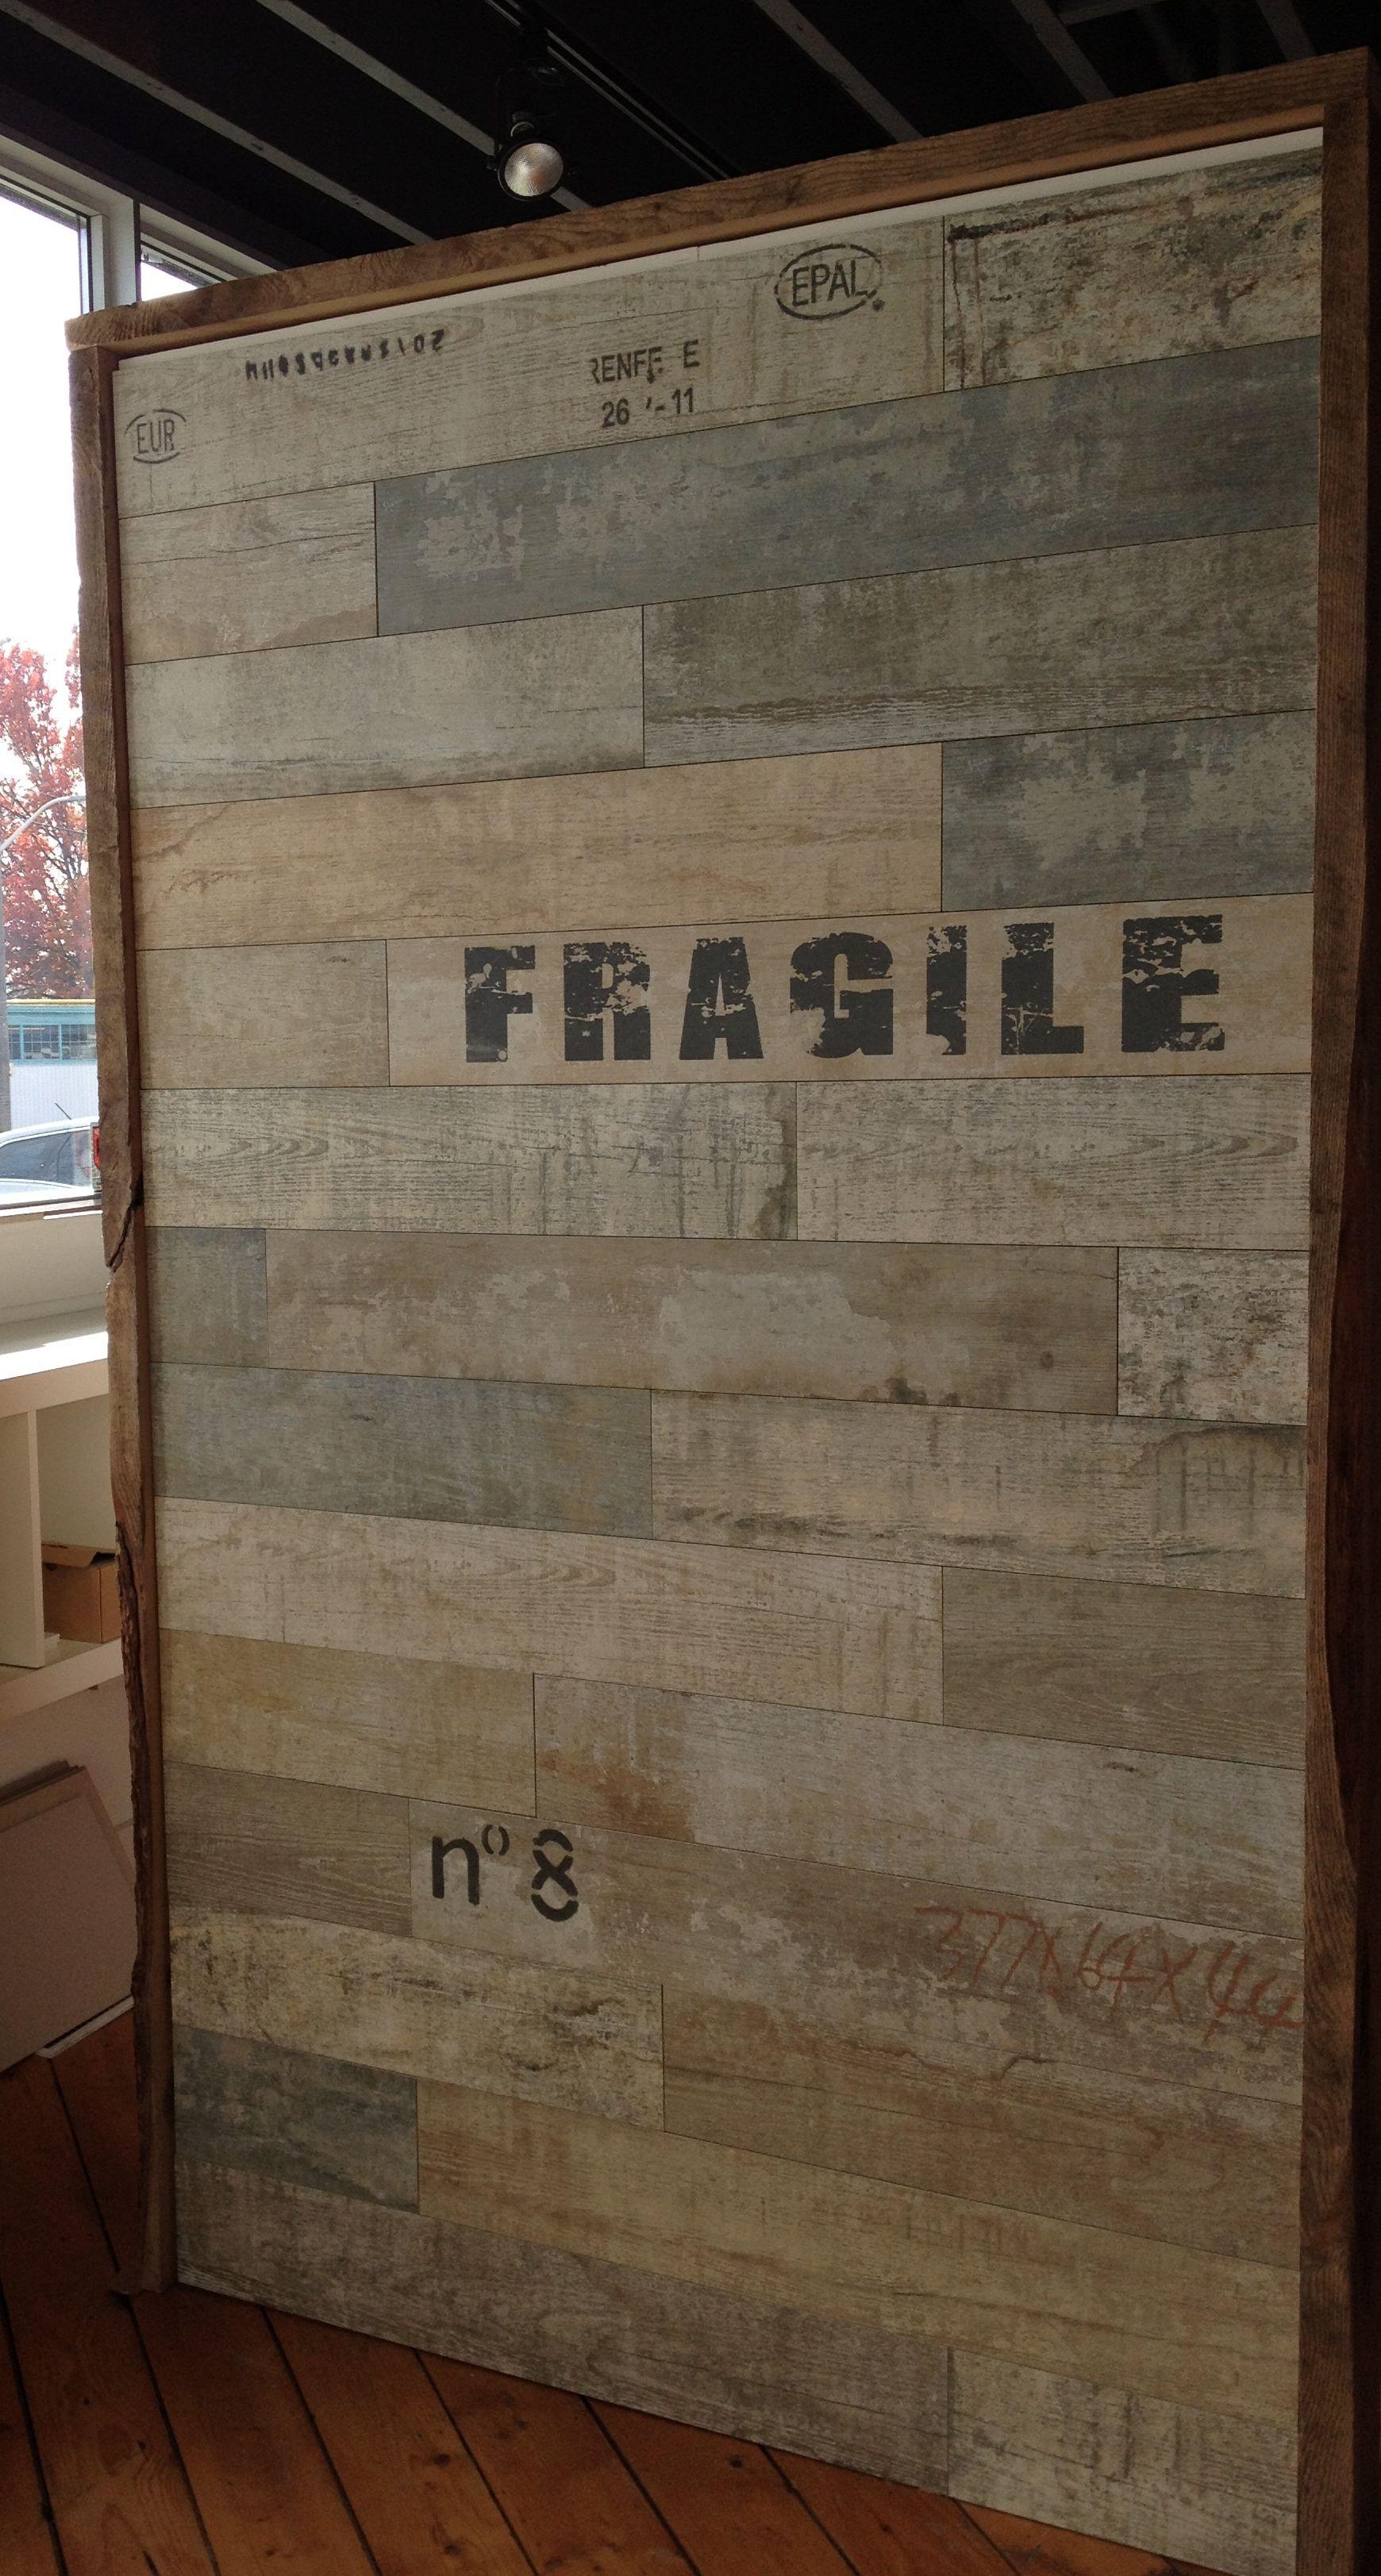 Graffiti wall tiles - Office Walls Timber Series Porcelain Graffiti Tile